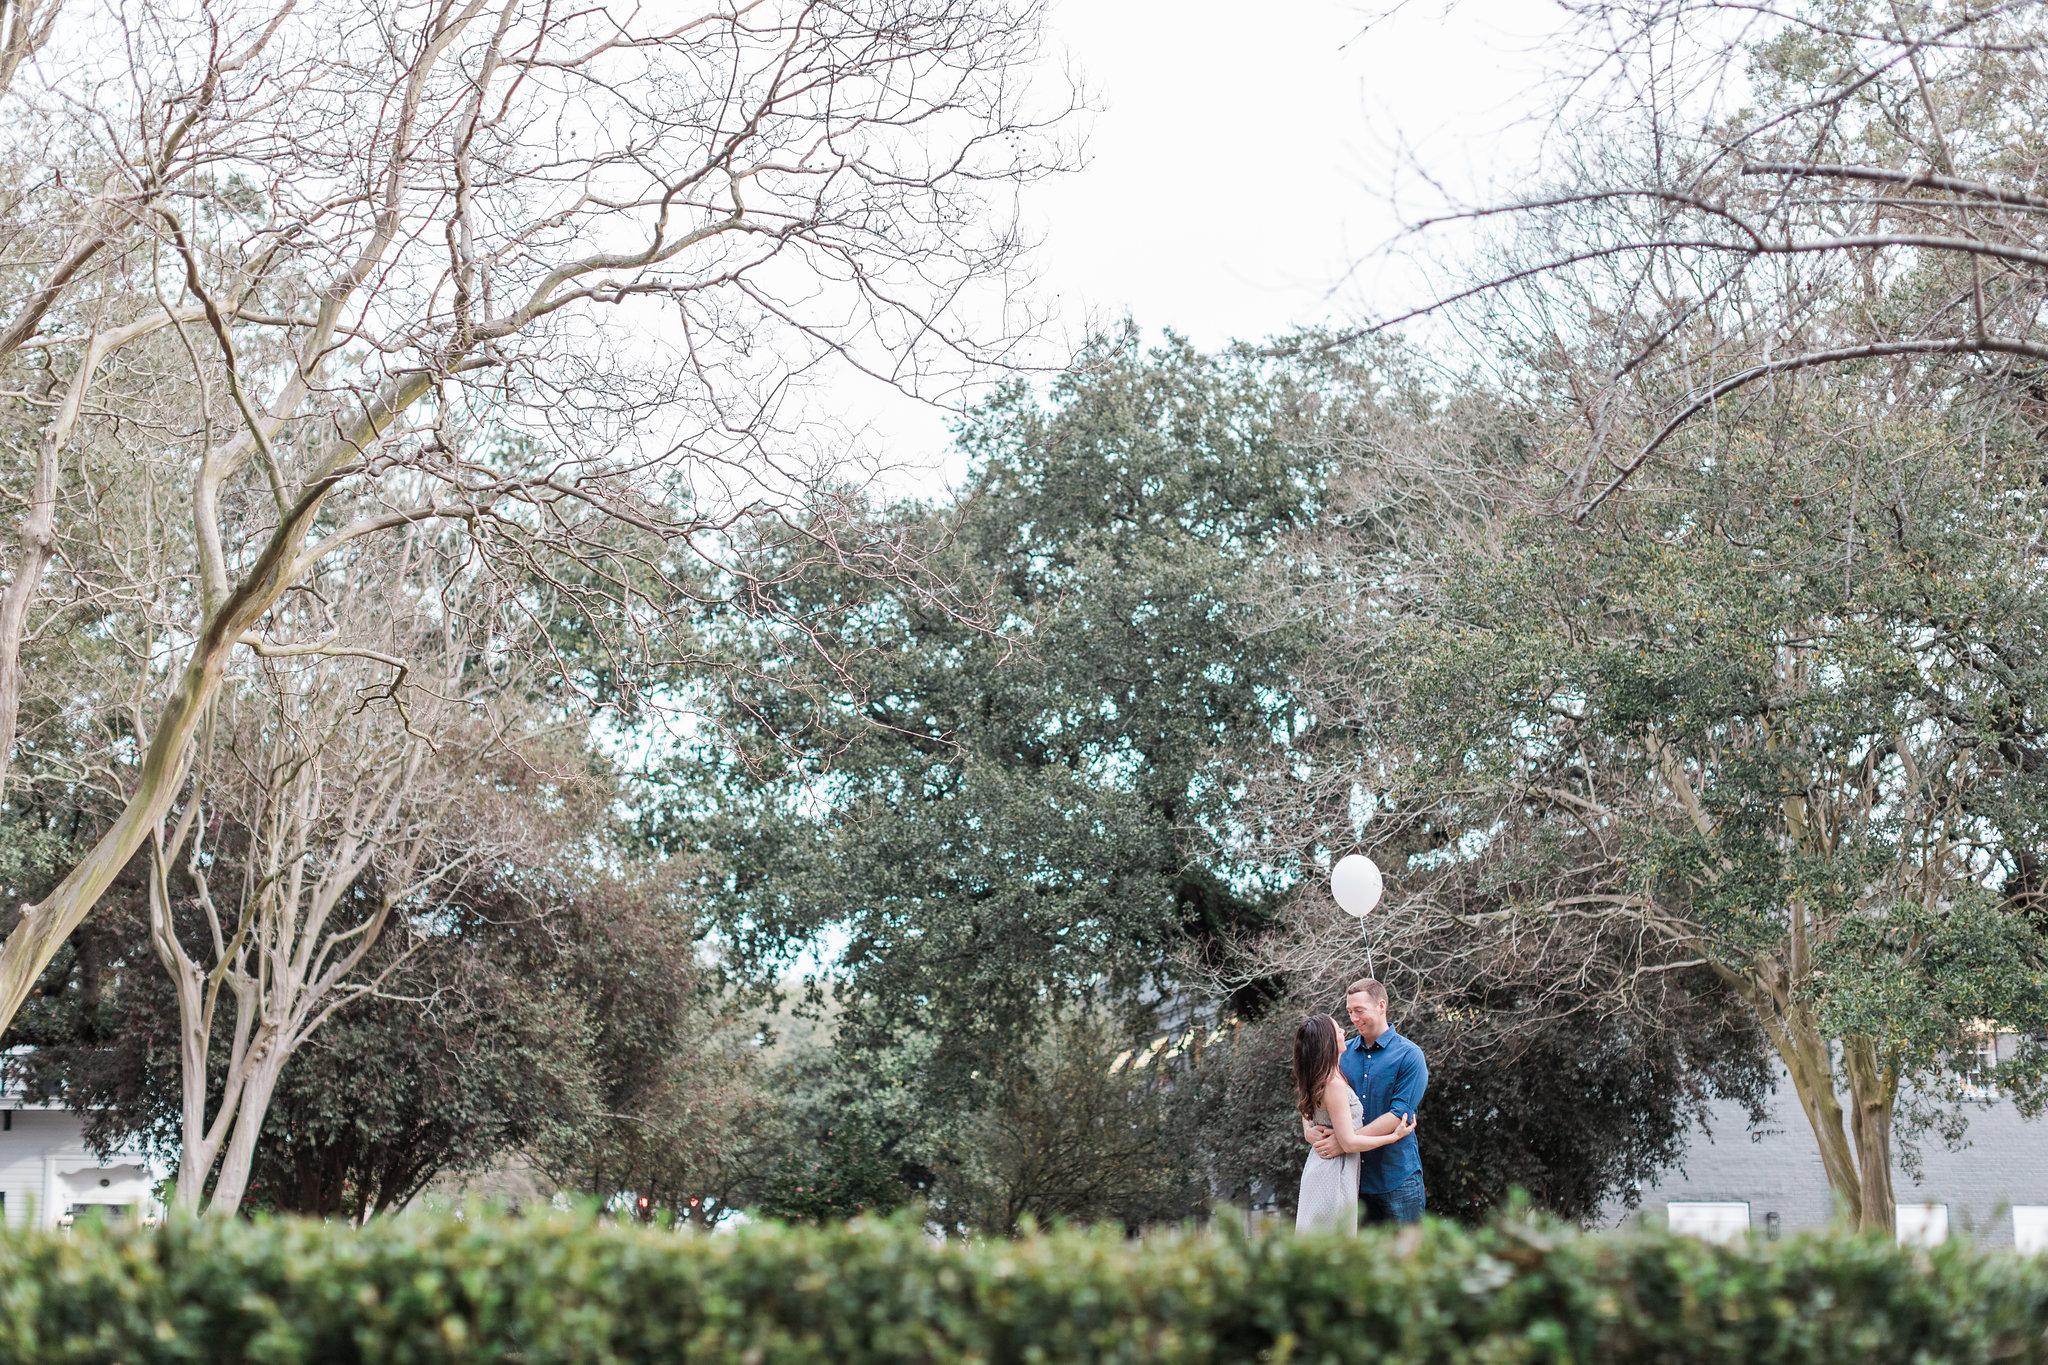 apt-b-photography-ansley-dj-memorial-shoot-savannah-wedding-photographer-lifestyle-portrait-photographer-washington-square-savannah-balloon-release-14.jpg